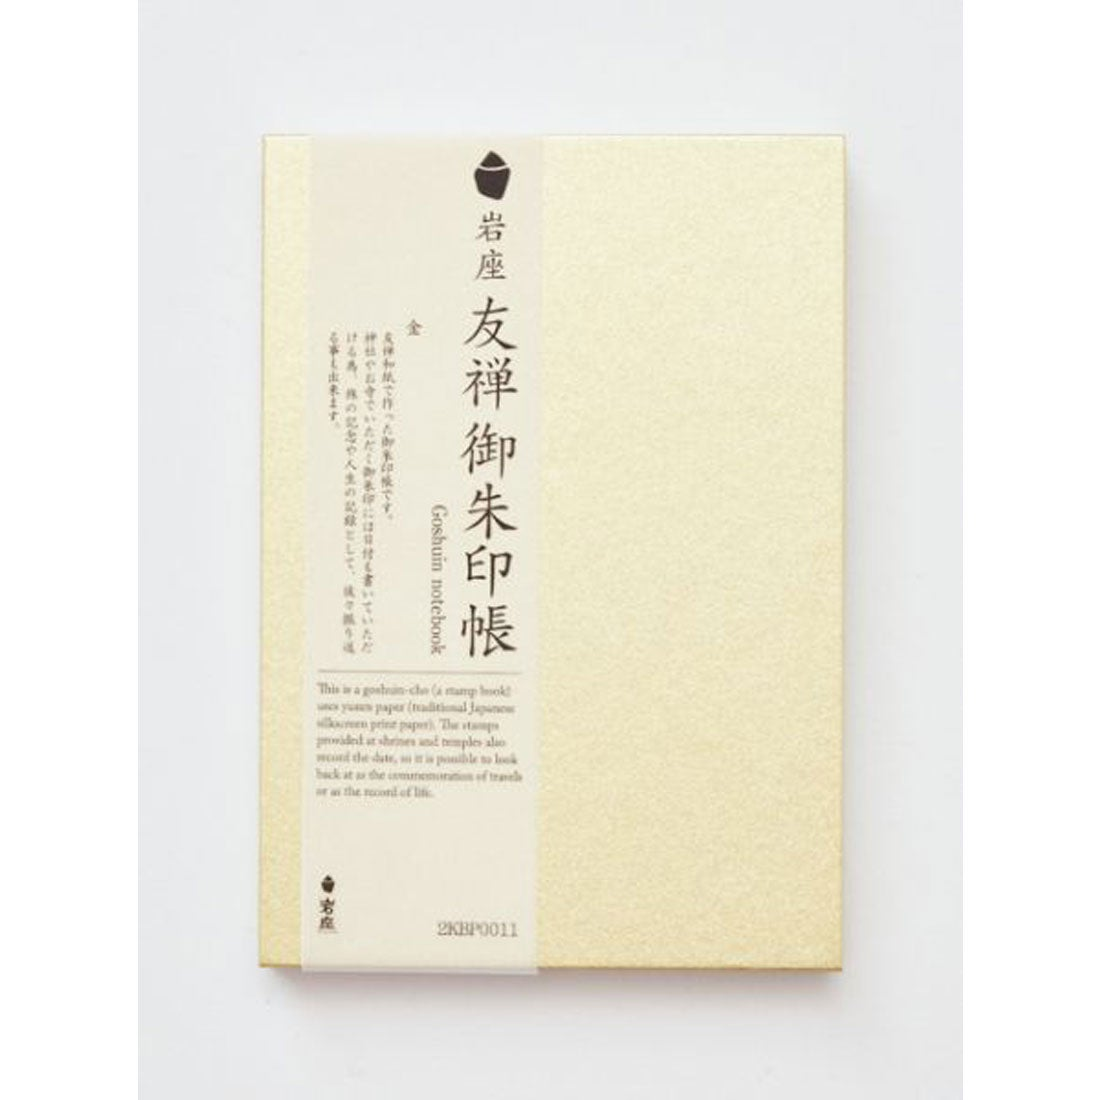 【岩座】友禅御朱印帳 / 金 ゴールド